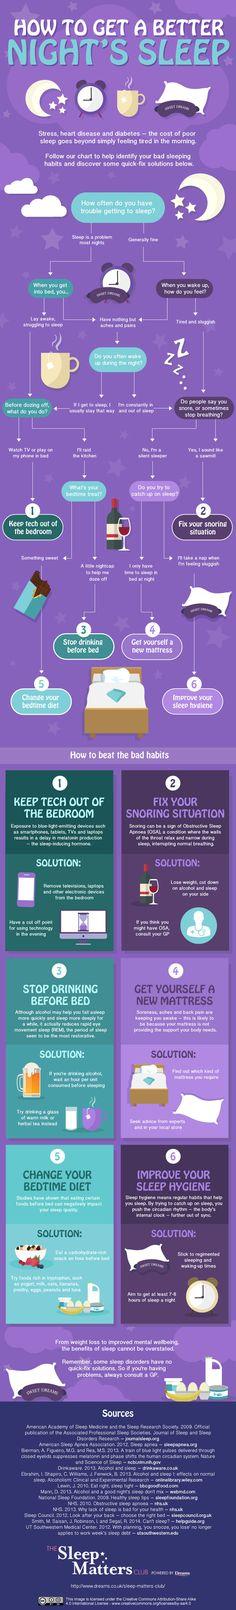 How to Get a Better Night's Sleep #infographic Flowchart #Sleep #Health